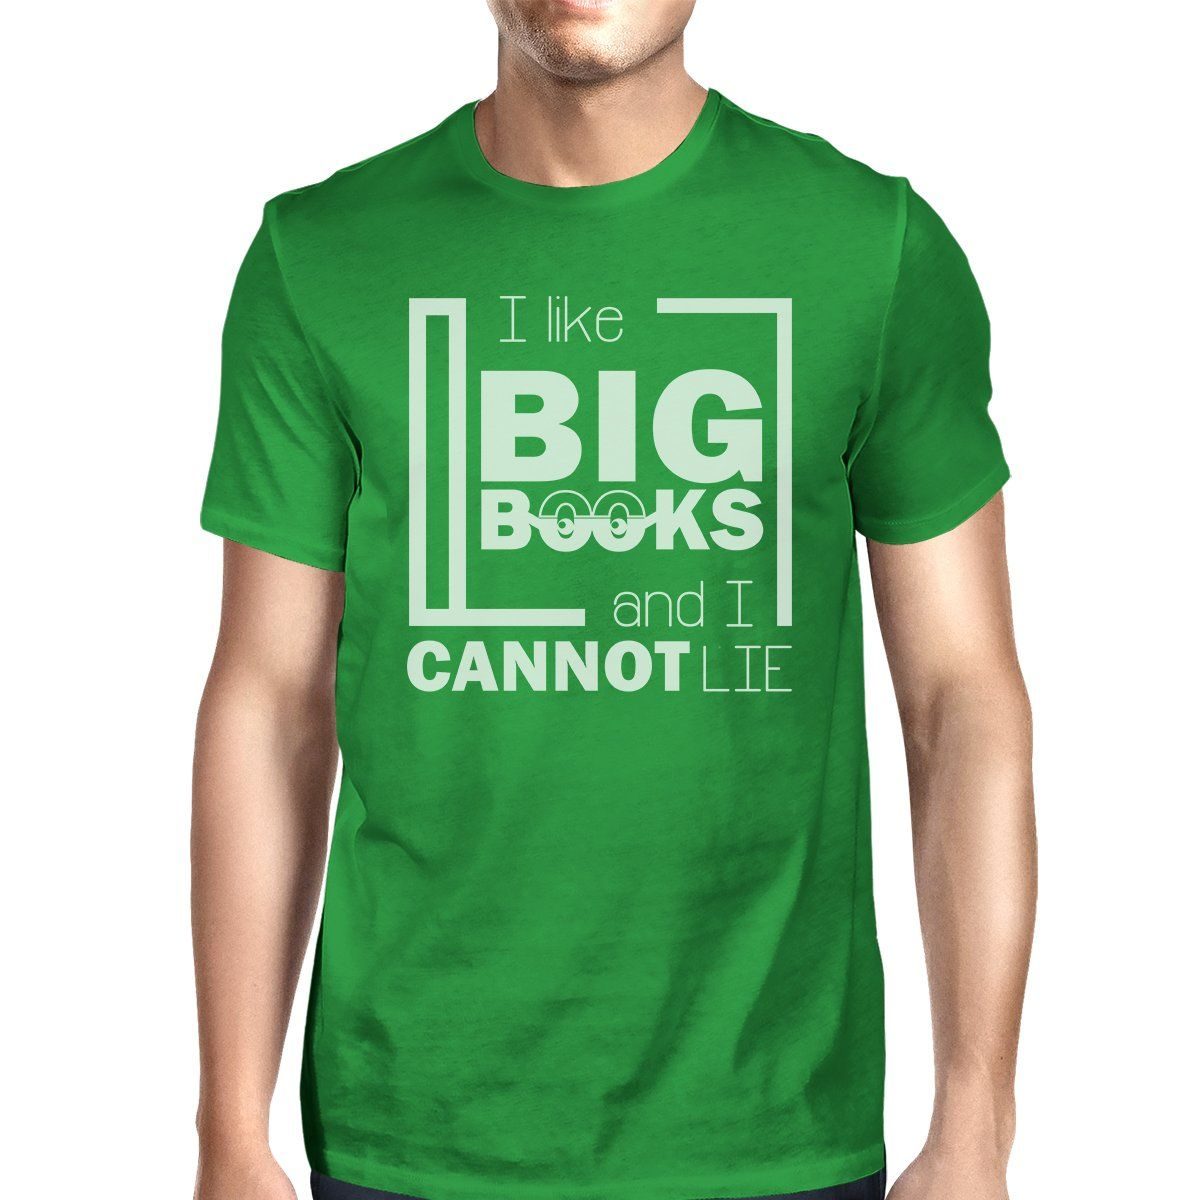 I Like Big Books Cannot Lie Mens Green Shirt